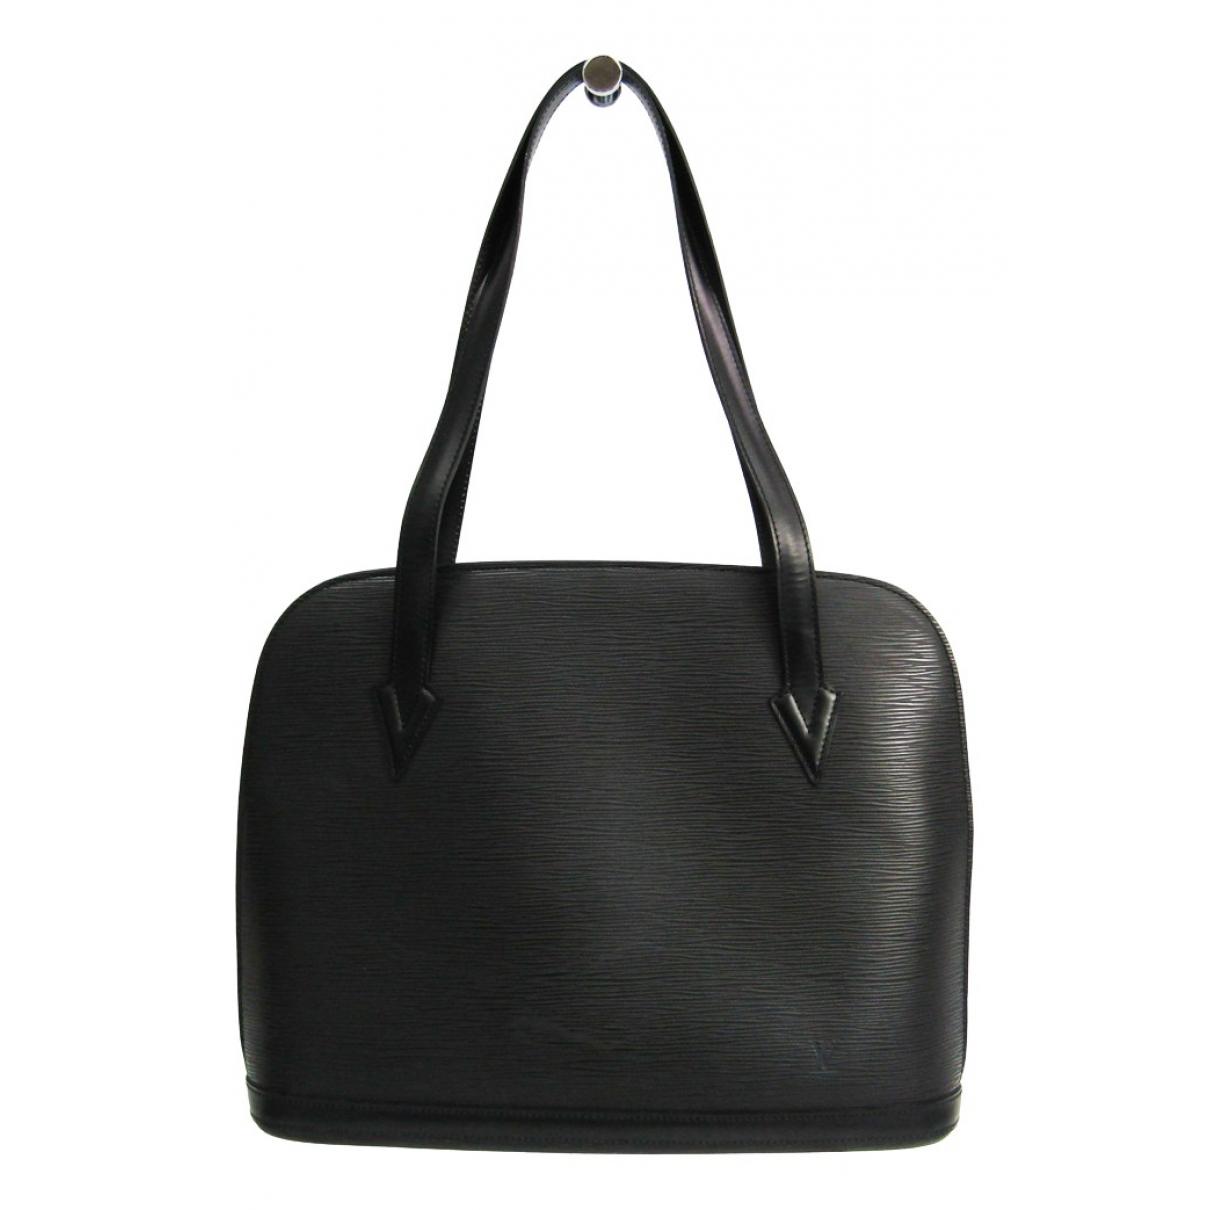 Louis Vuitton Lussac Black Leather handbag for Women \N